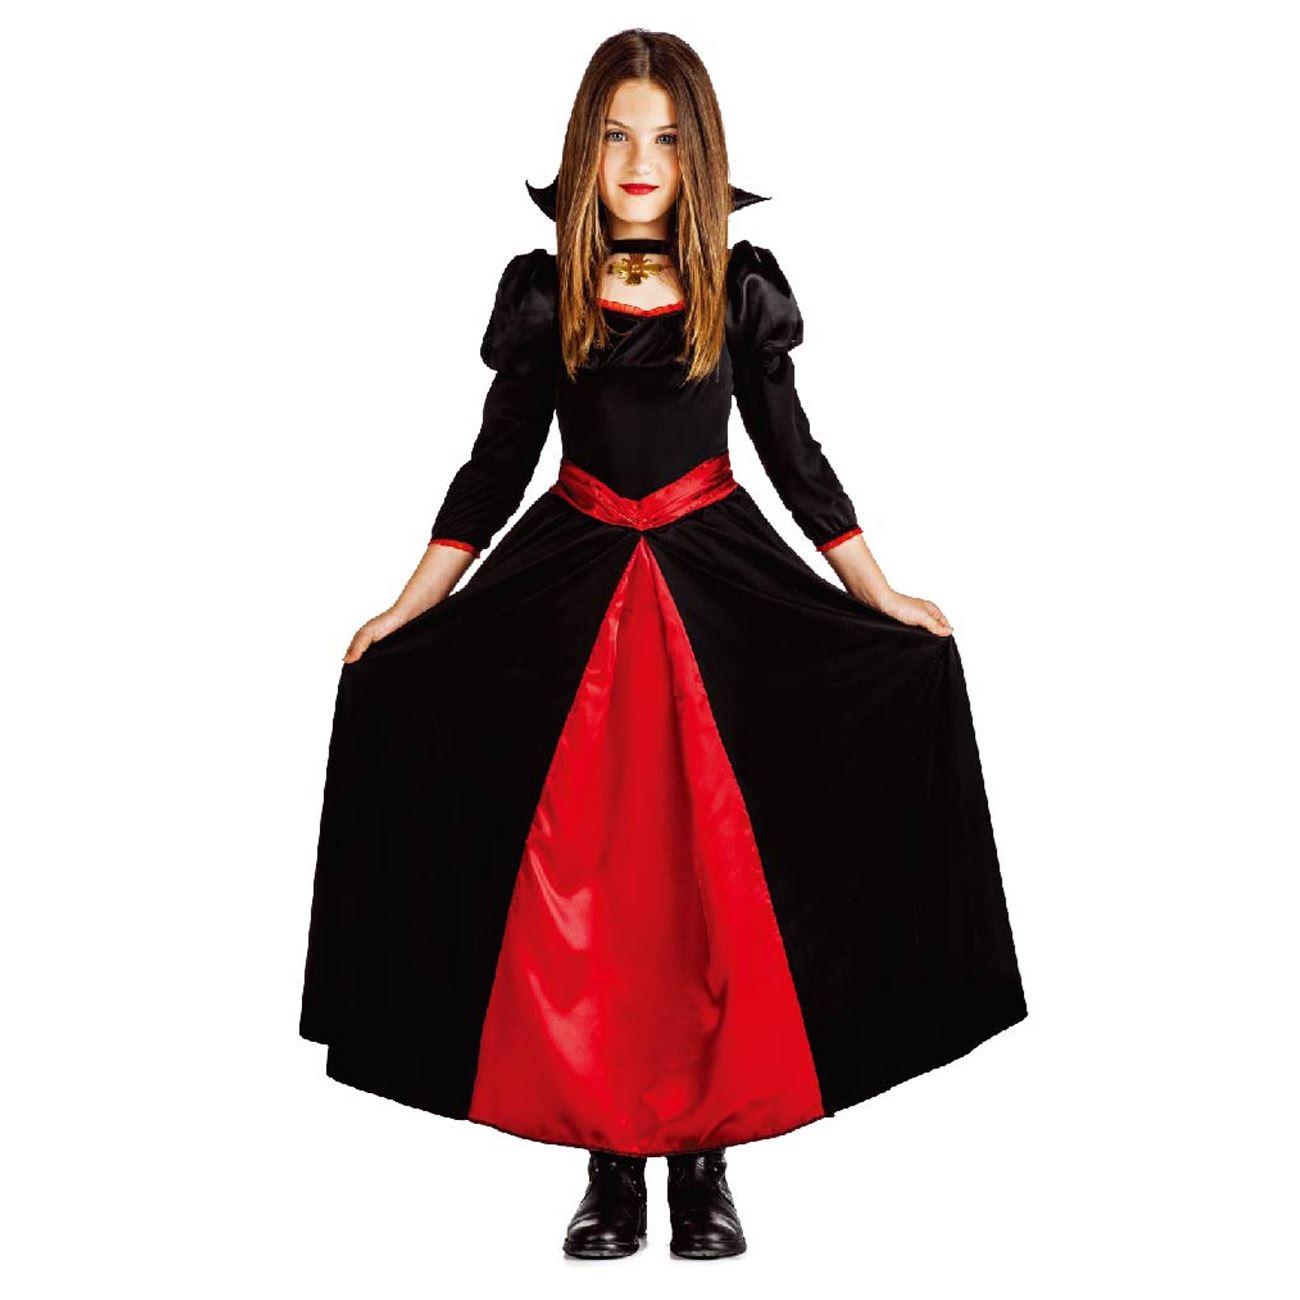 e52470279f5 Αποκριάτικη Στολή Κορίτσι Βρικόλακας (Μακρύ Φόρεμα) < Στoλές Διαφόρων  Χαρακτήρων | Jumbo